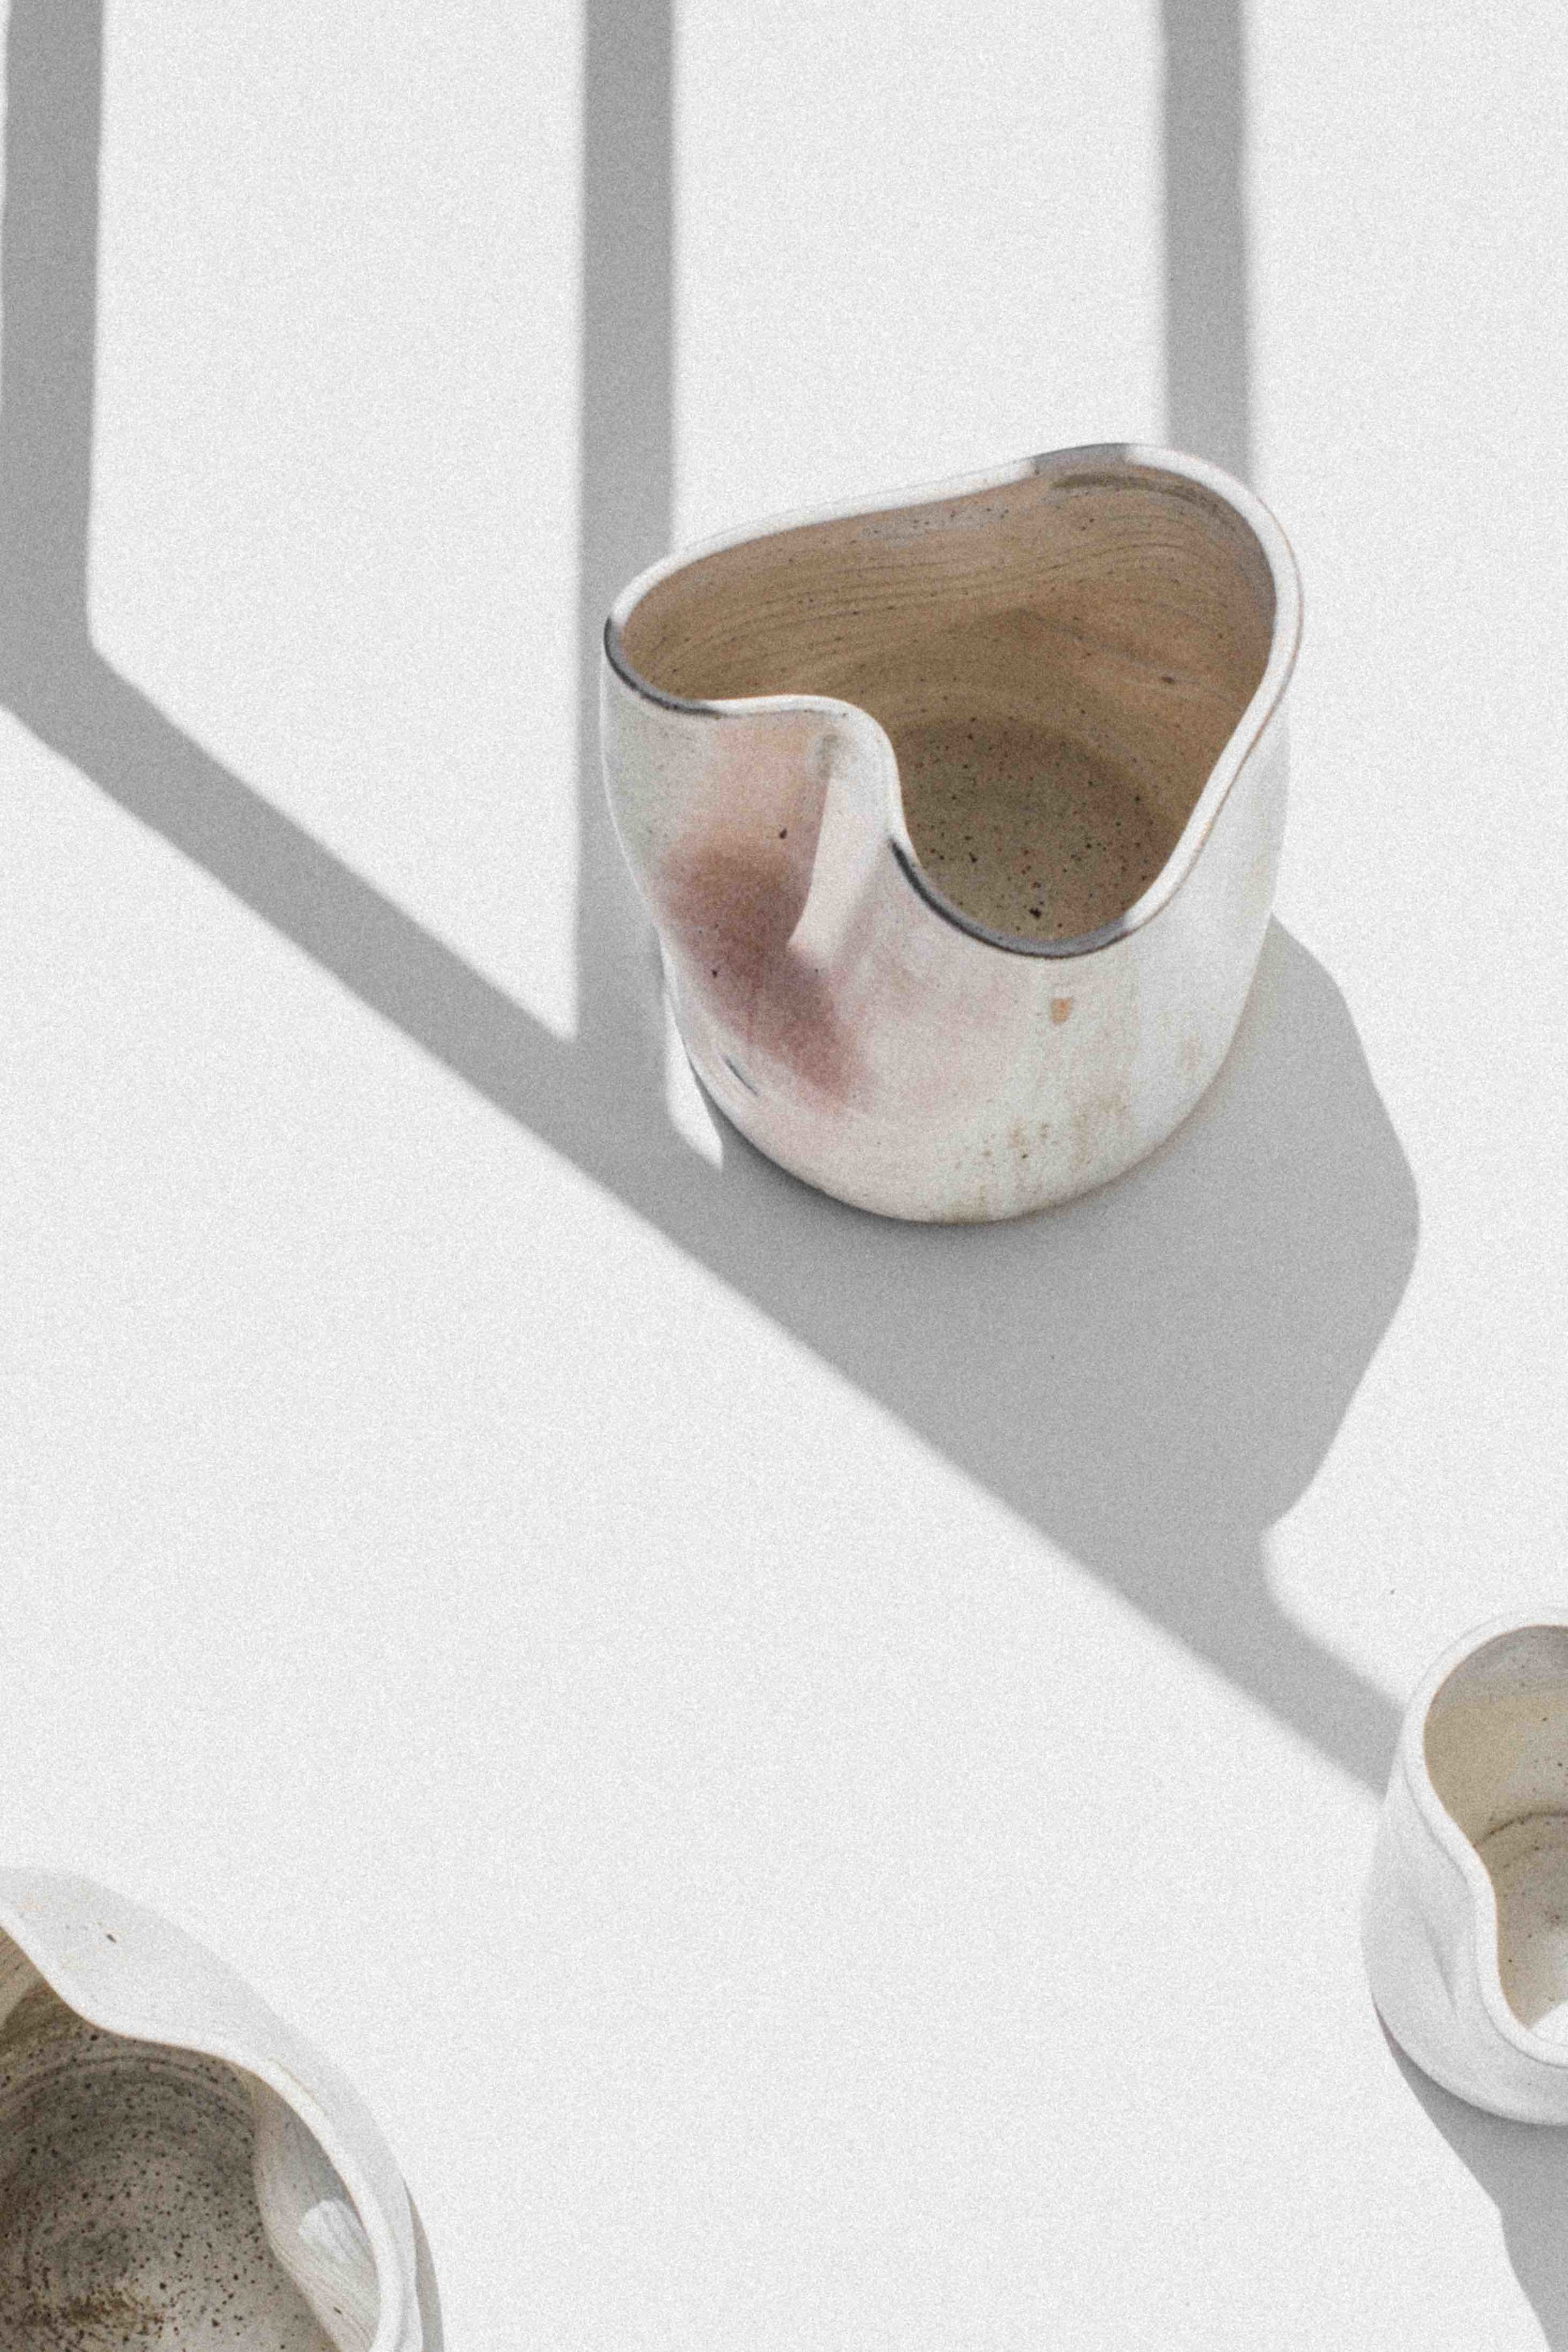 hap ceramics_Maxi Hoffmann_Düsseldorf_Keramik_Ceramics_Vase_Rosa_Handgemacht_Interior_Design.jpg